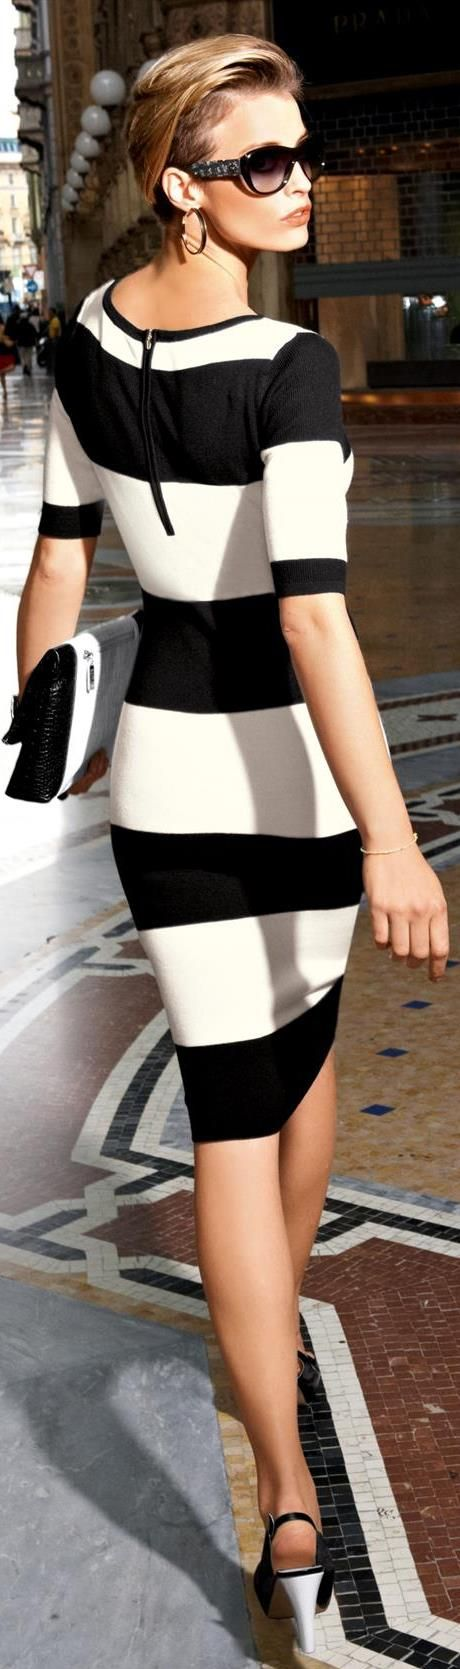 Bold Stripes Madeleine.com #fashion #street #woman #style  ✔BWC